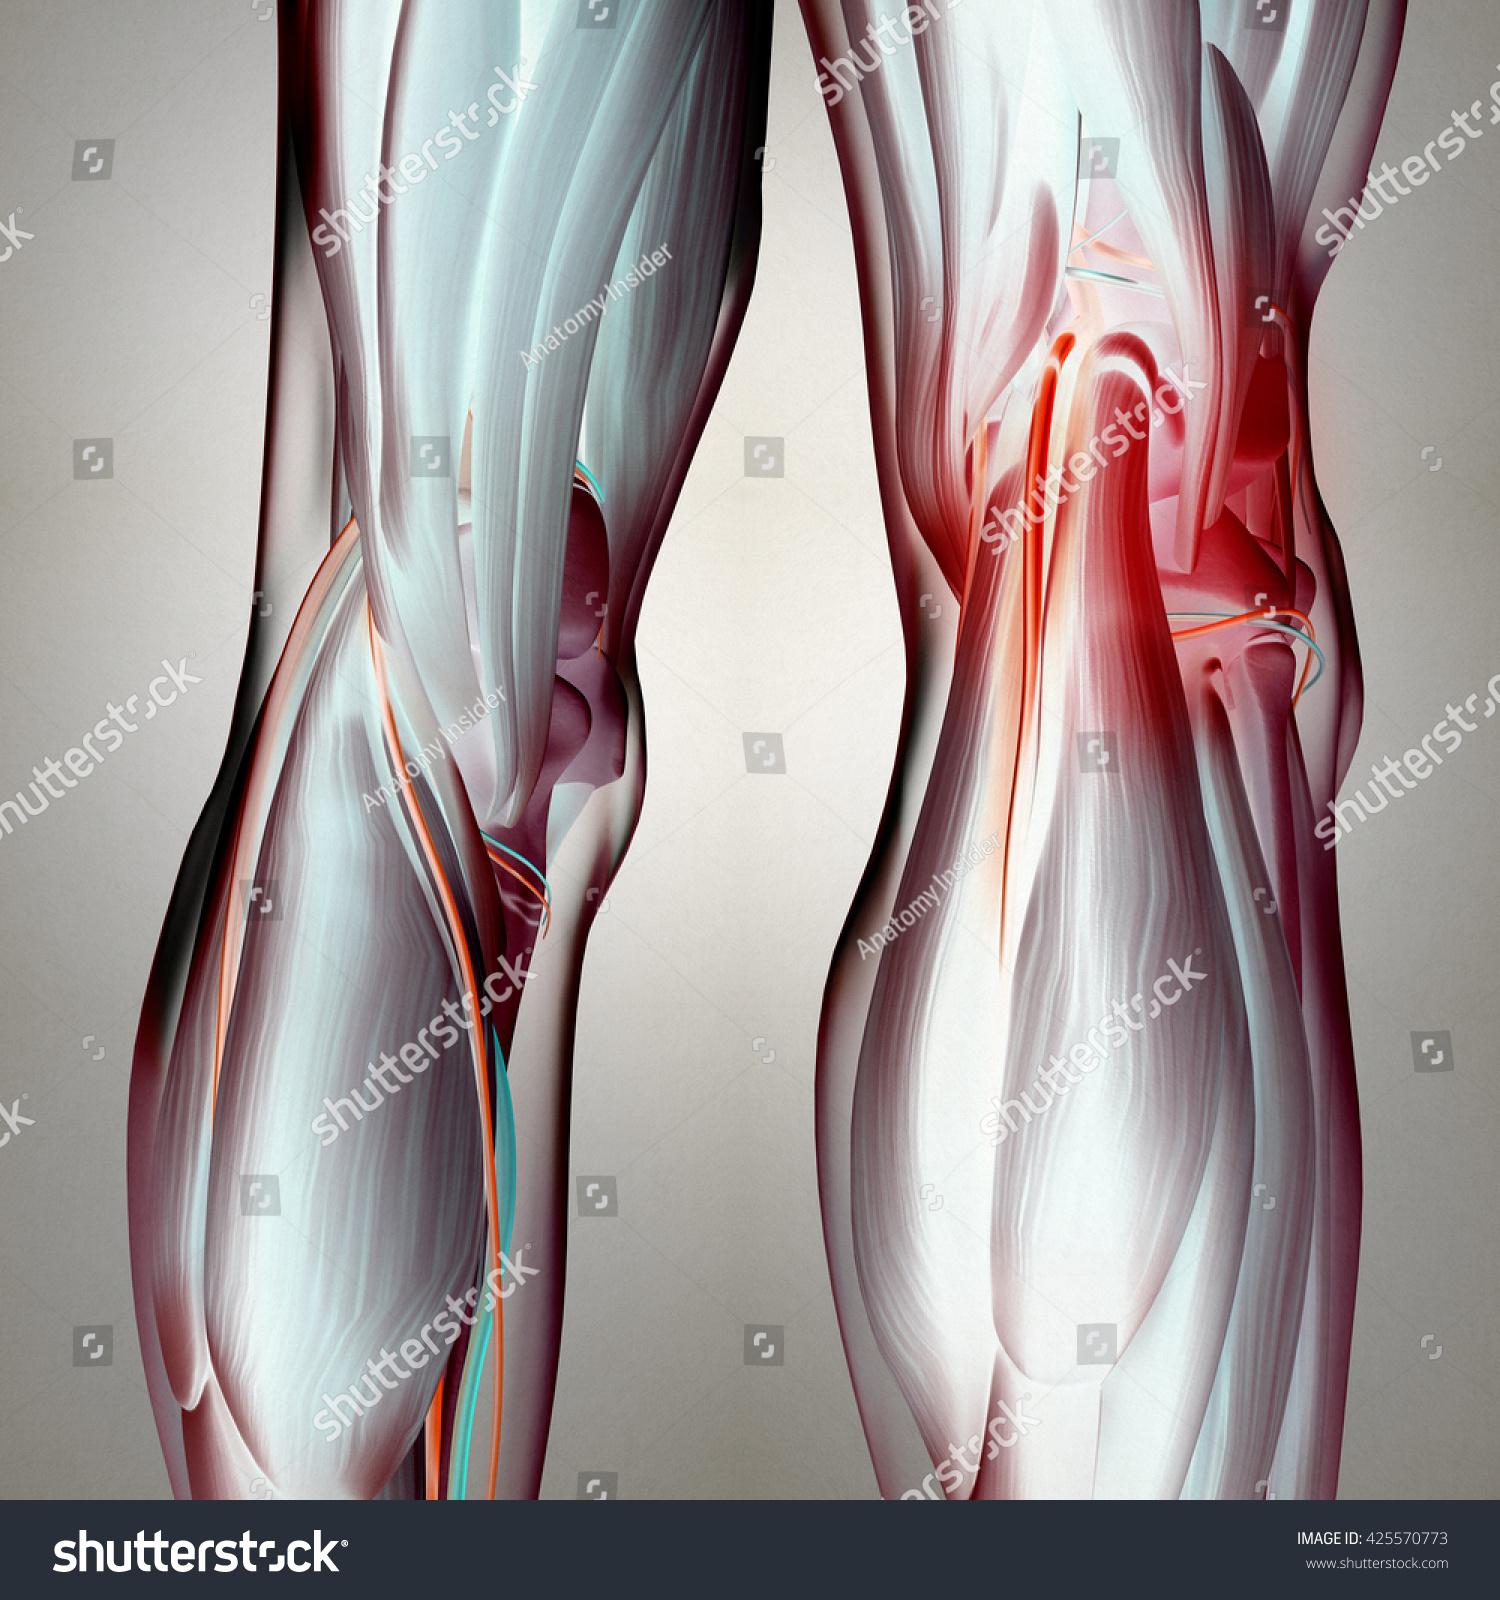 Royalty Free Stock Illustration Of Human Anatomy Back Legs Calf